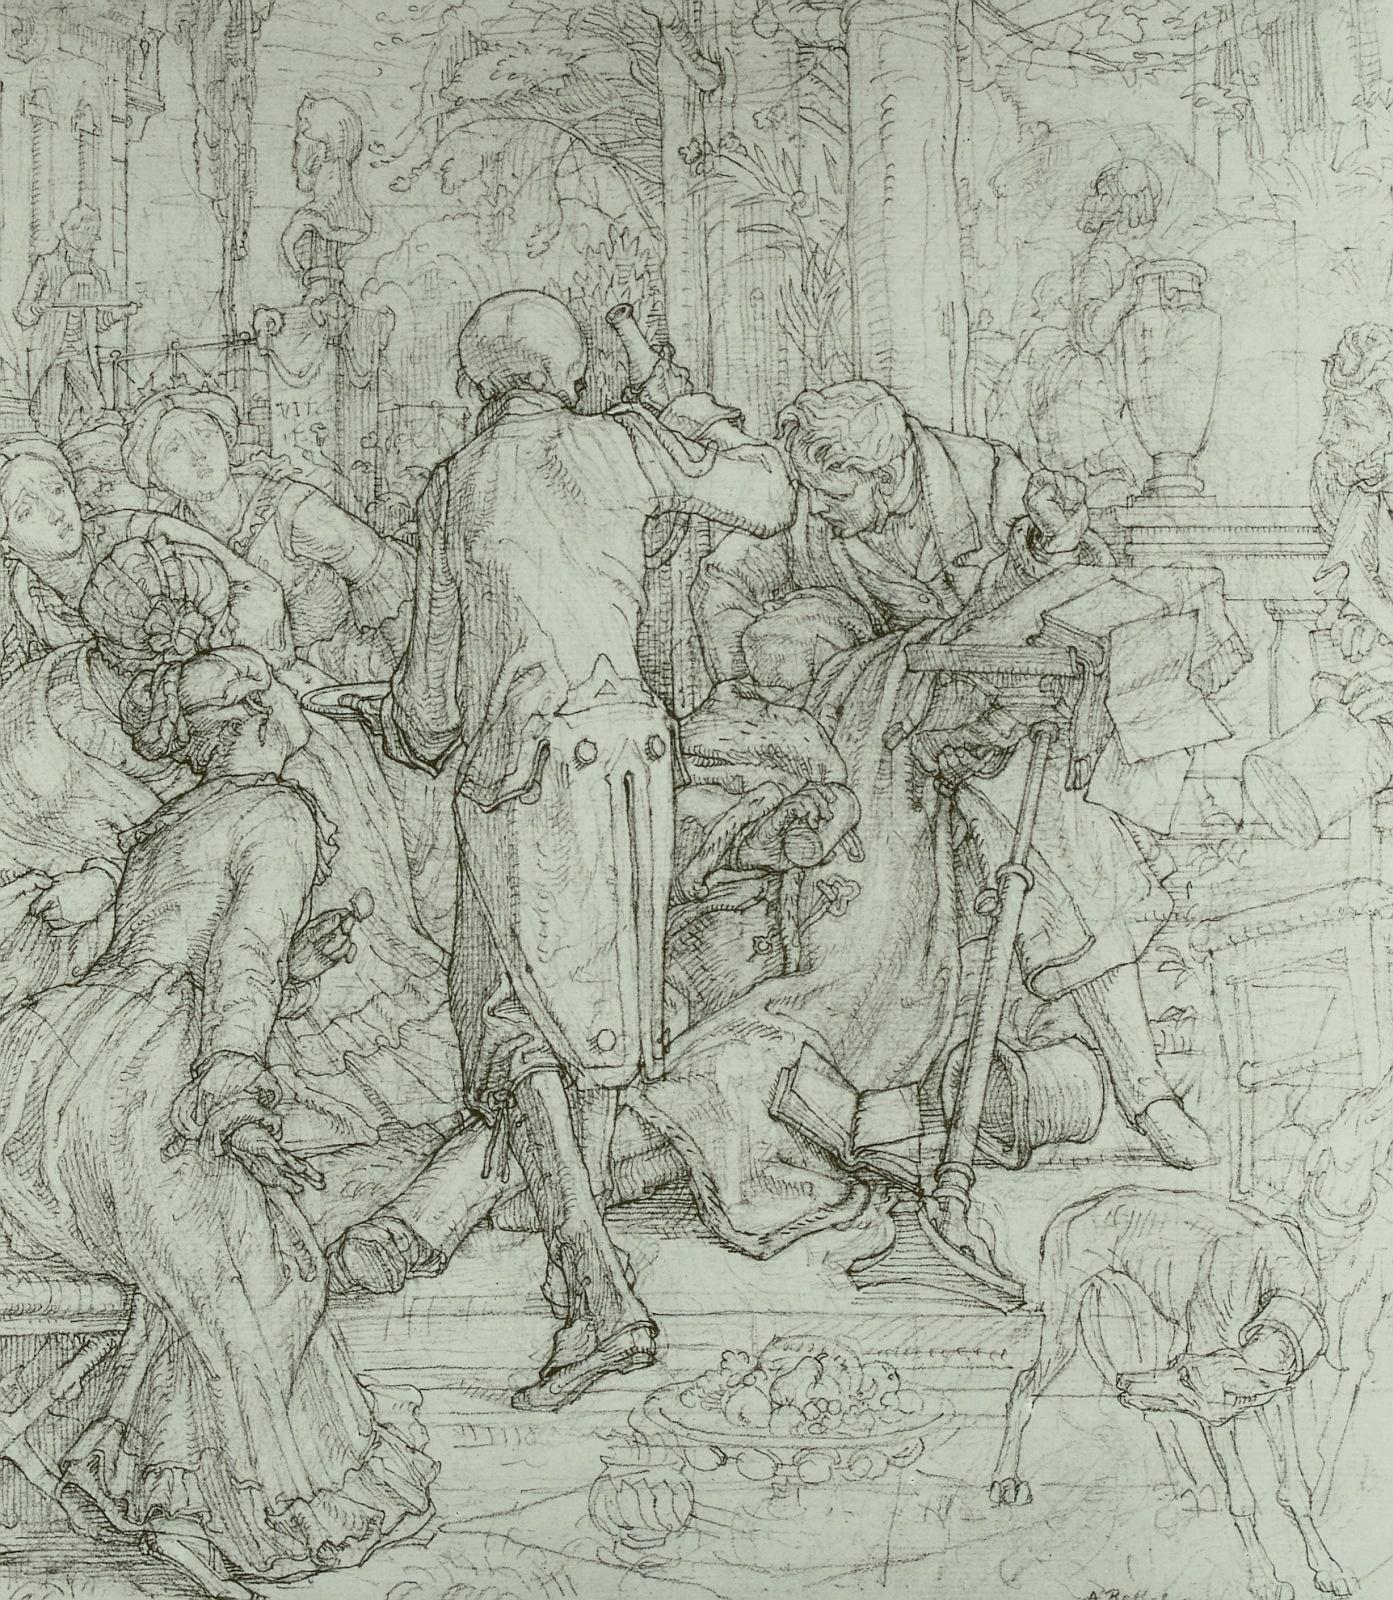 Alfred Rethel 1847-48 La mort comme serviteur dessin kupferstichkabinett dresde